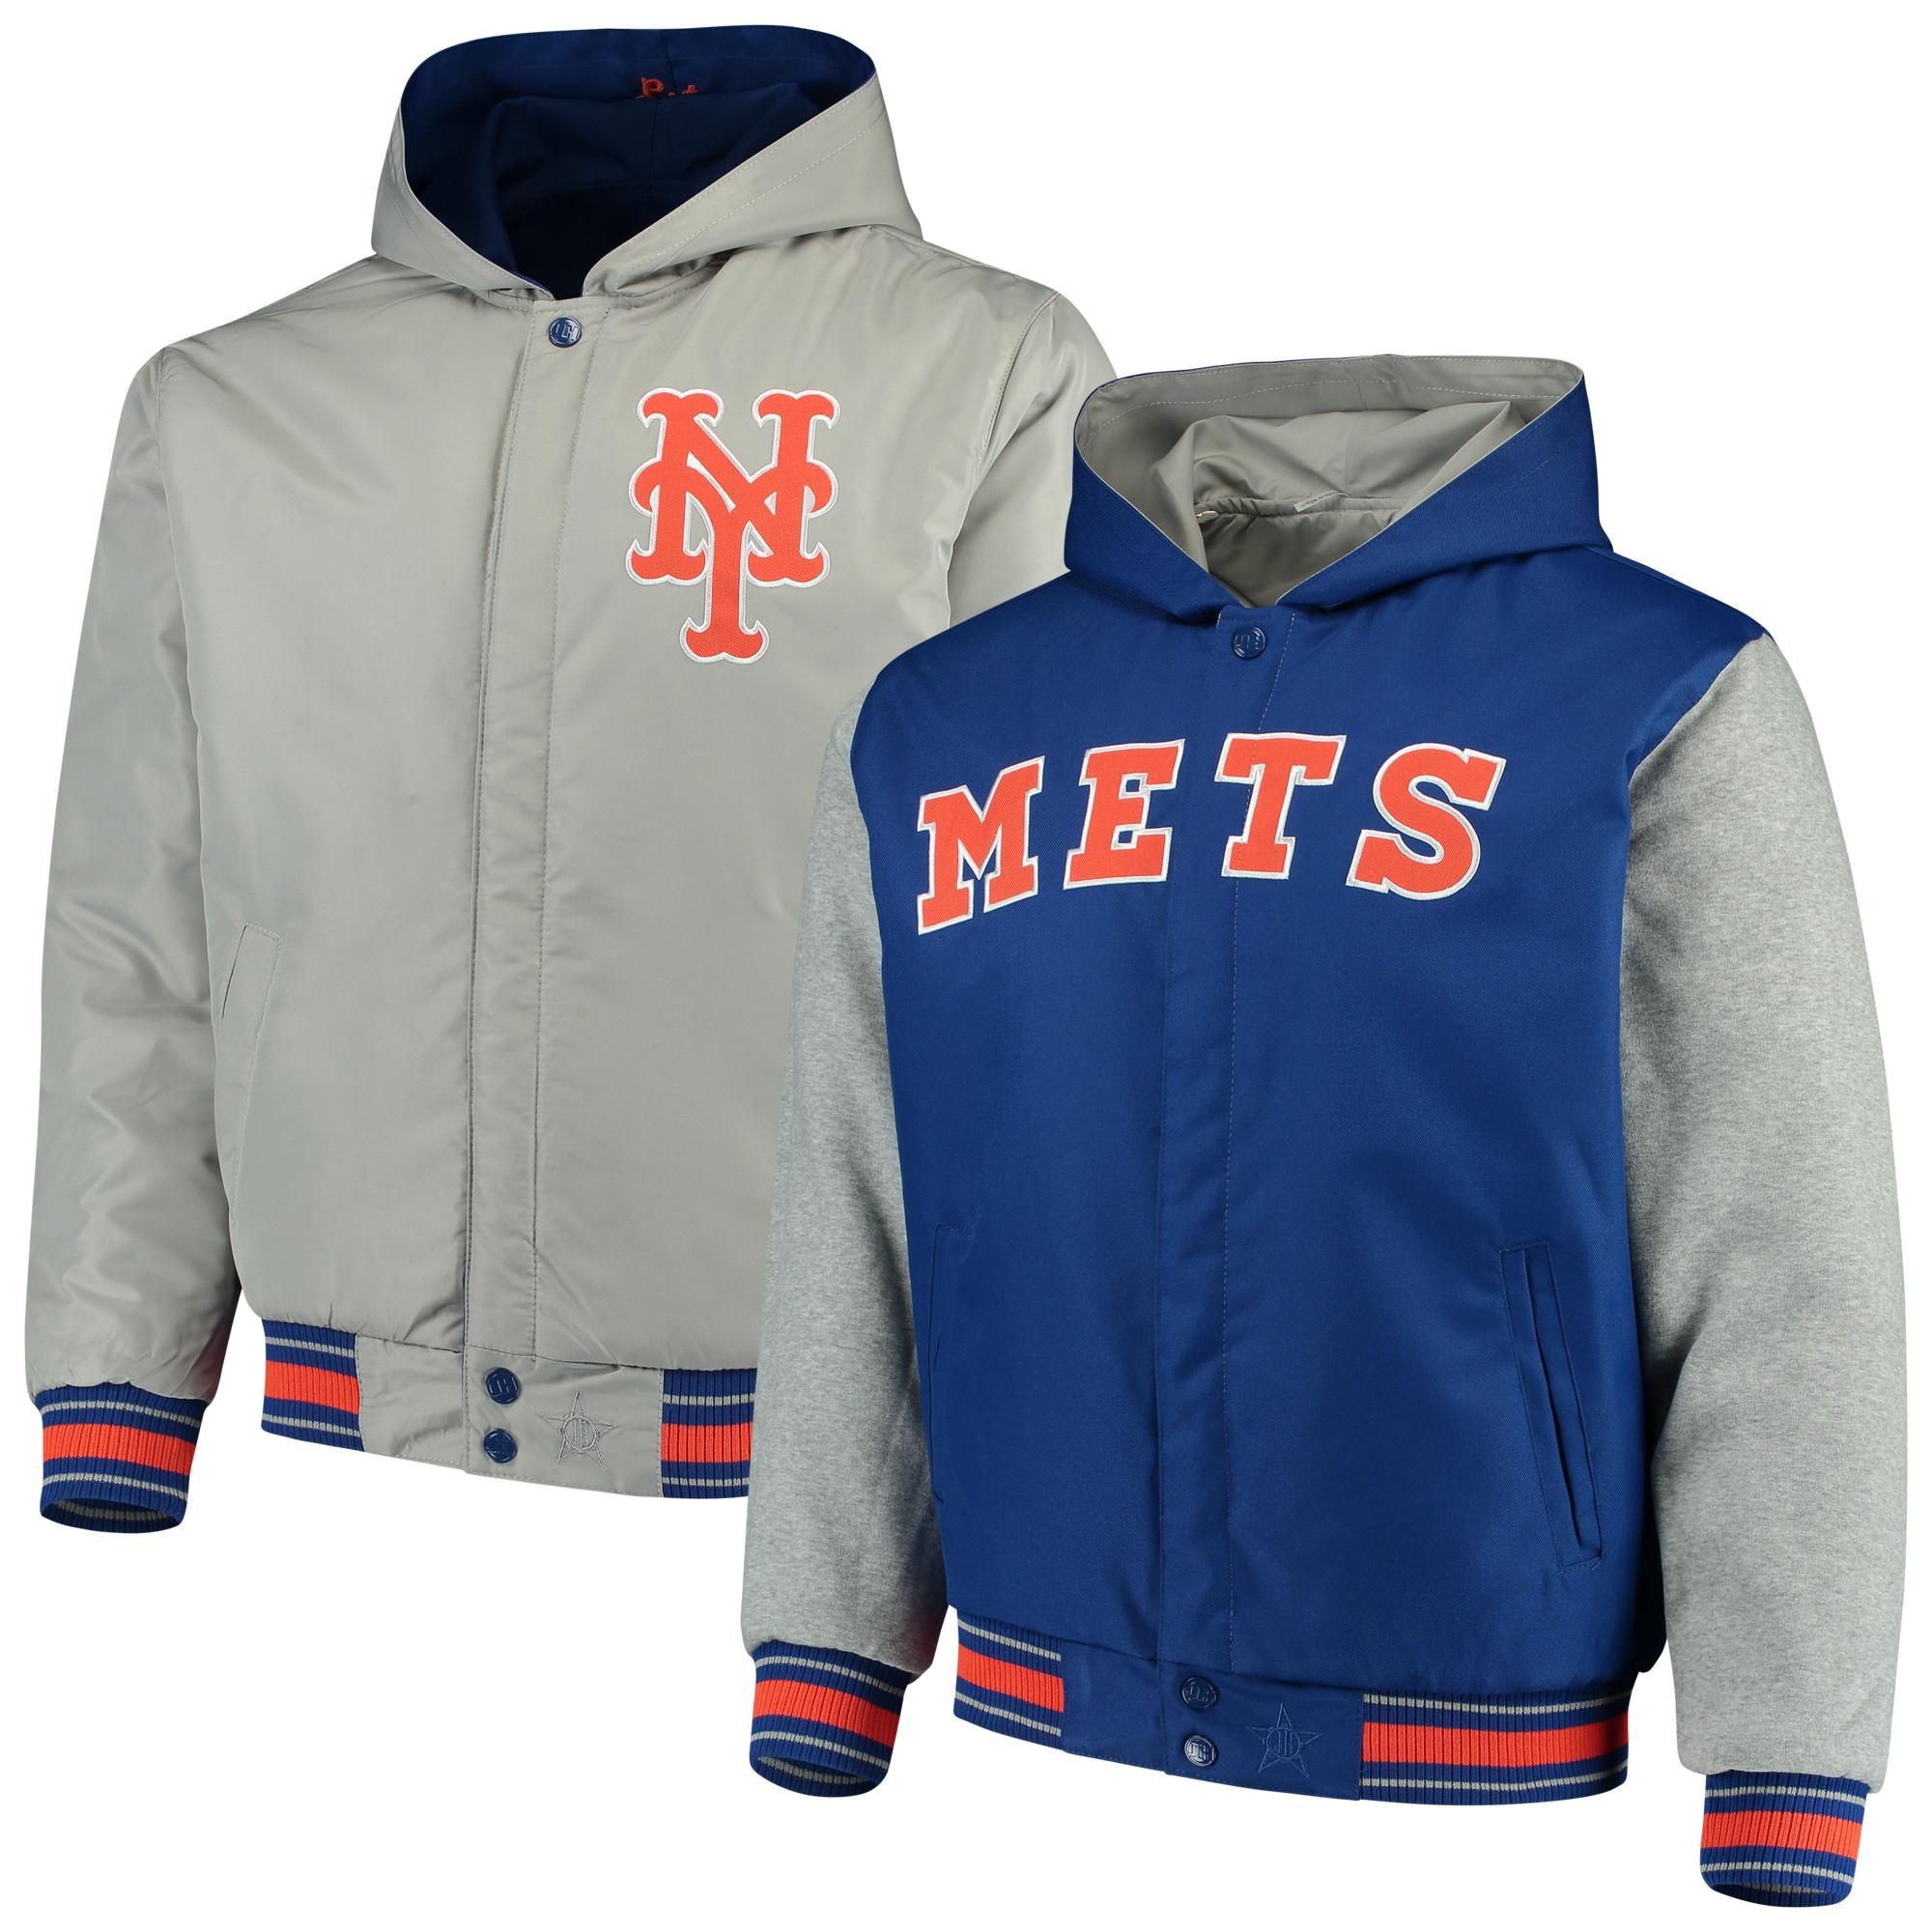 New York Mets JH Design Reversible Full-Snap Twill Jacket - Royal/Gray